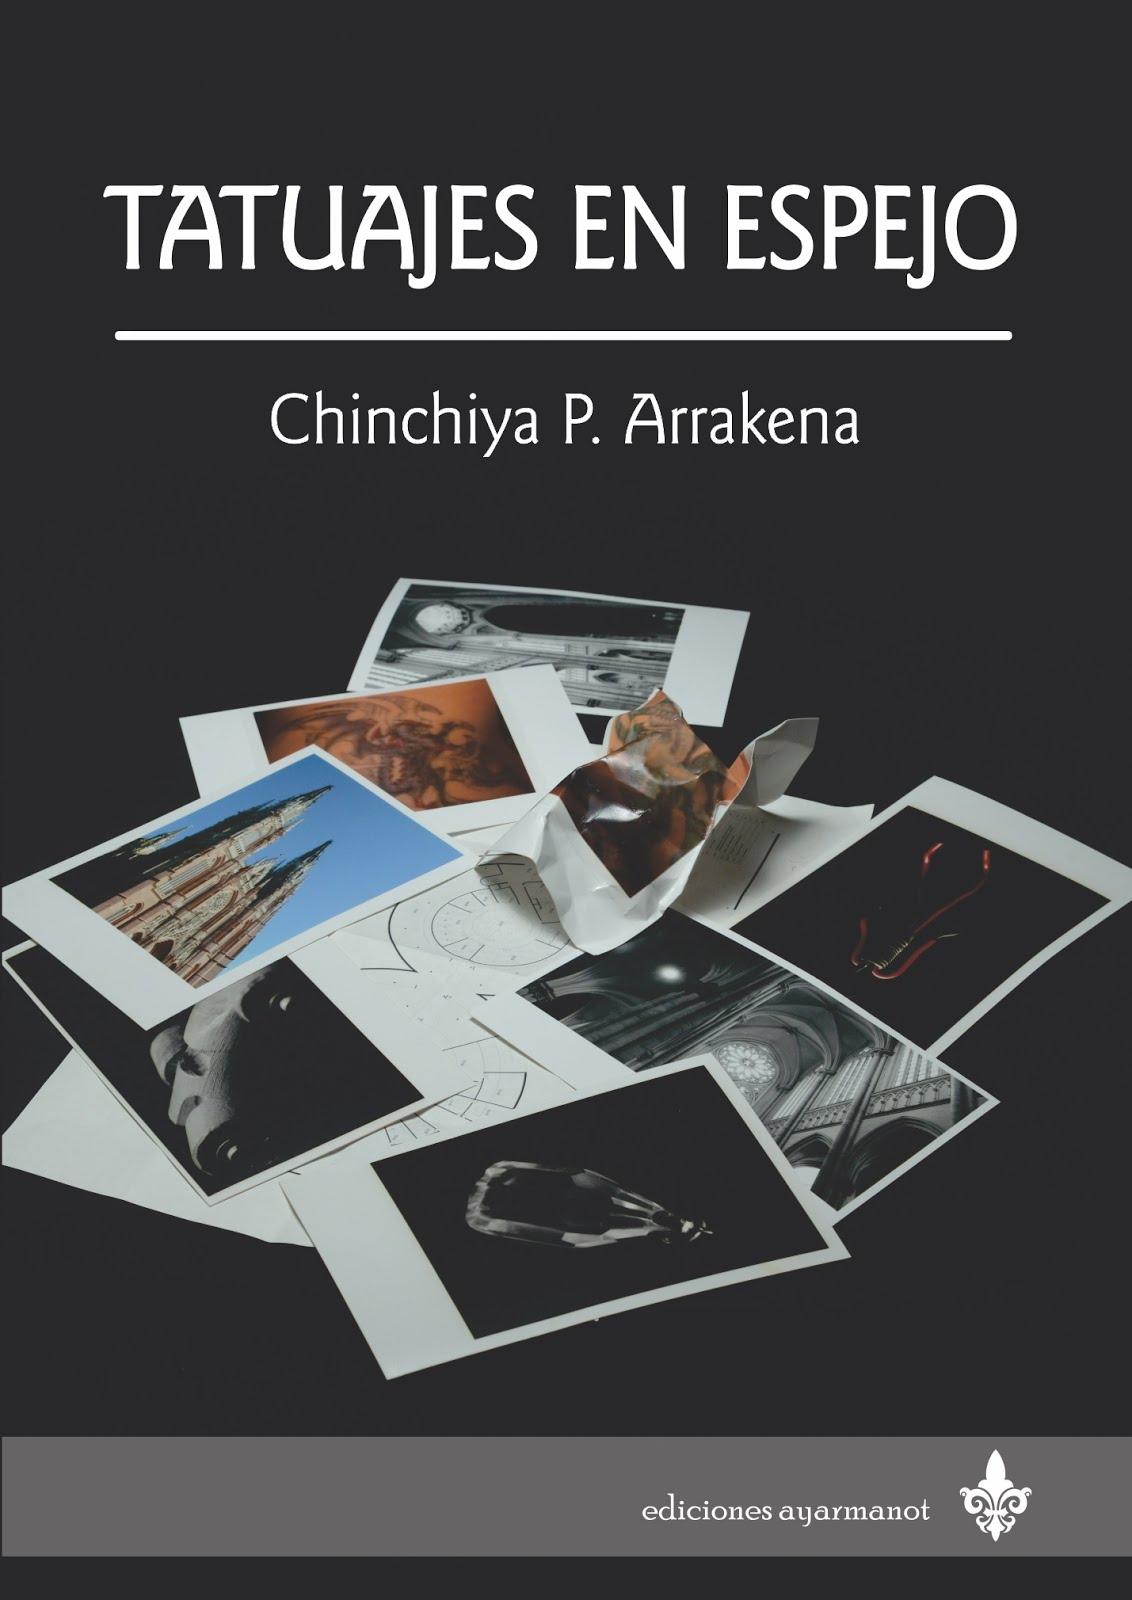 TATUAJES EN ESPEJO Chinchiya Arrakena